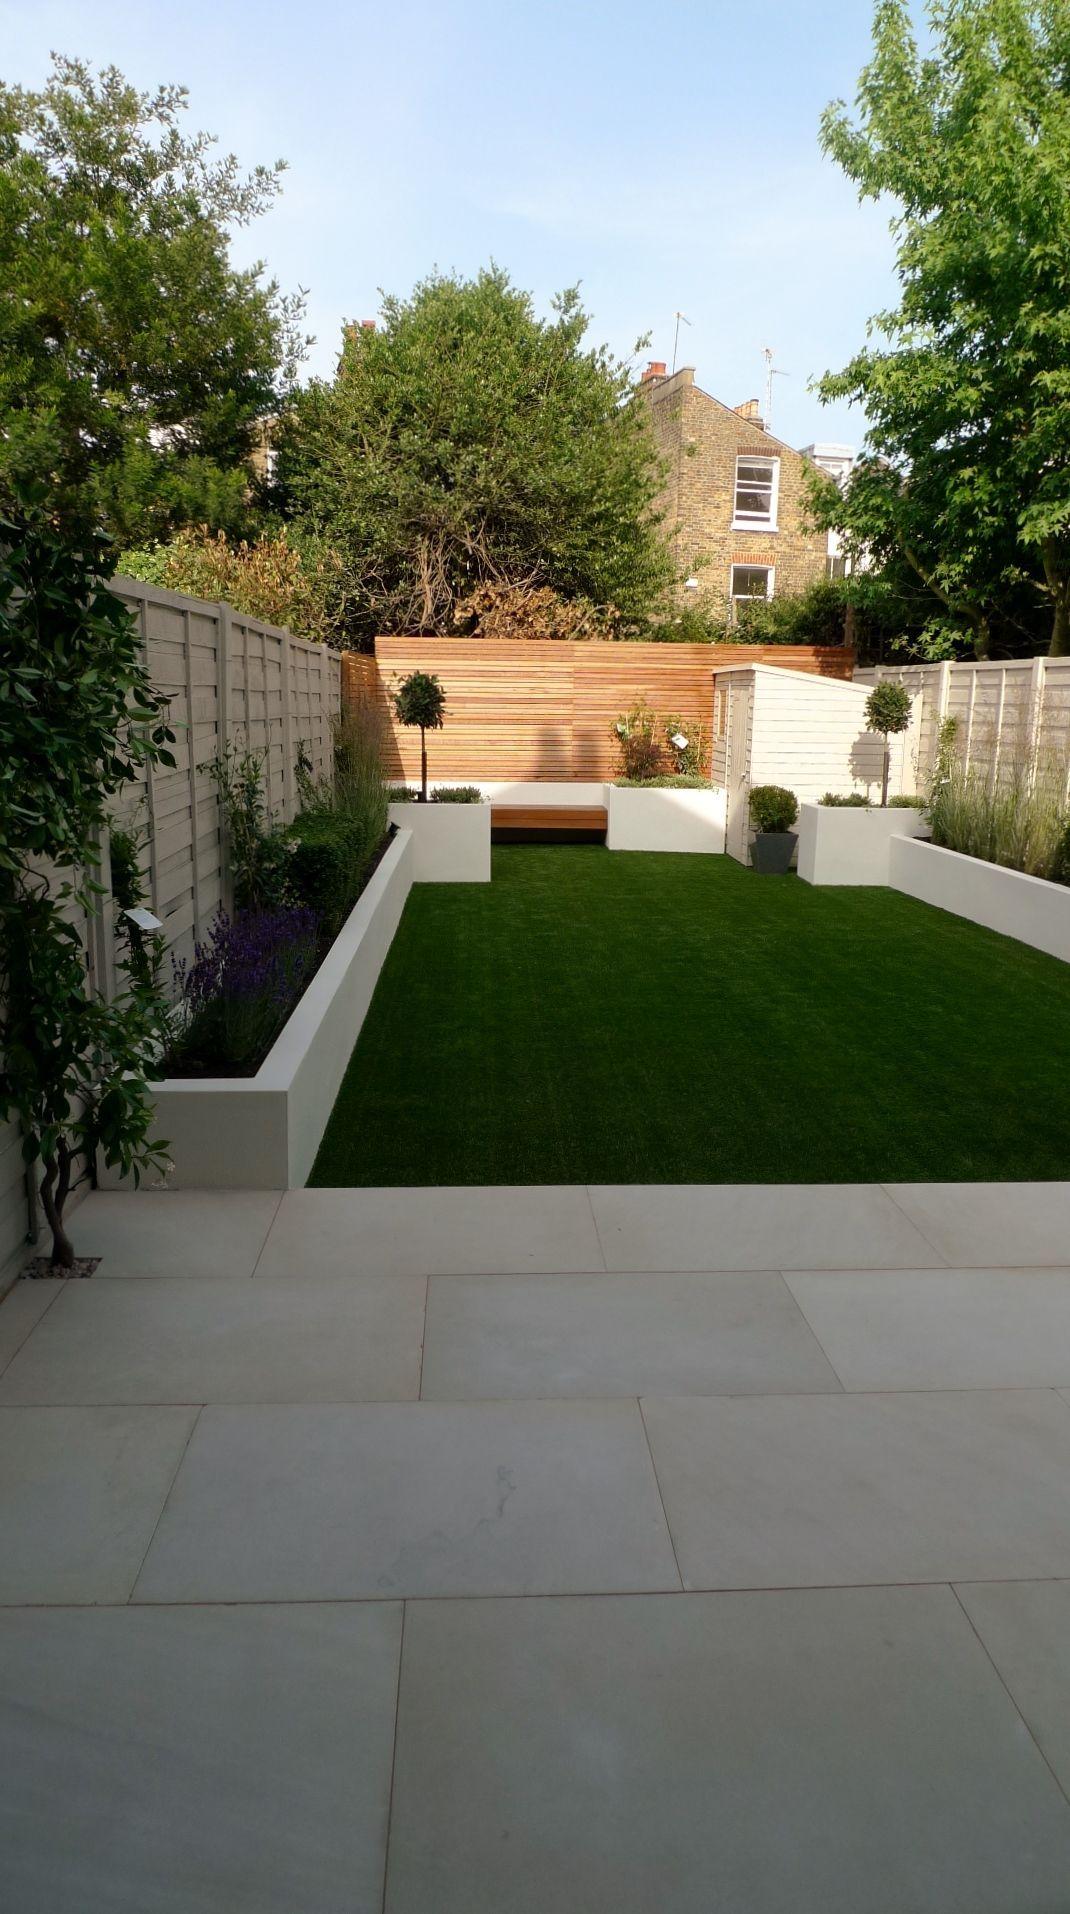 c0491003d75a220a681b298b16fa6aaf - Better Homes And Gardens Design Ideas